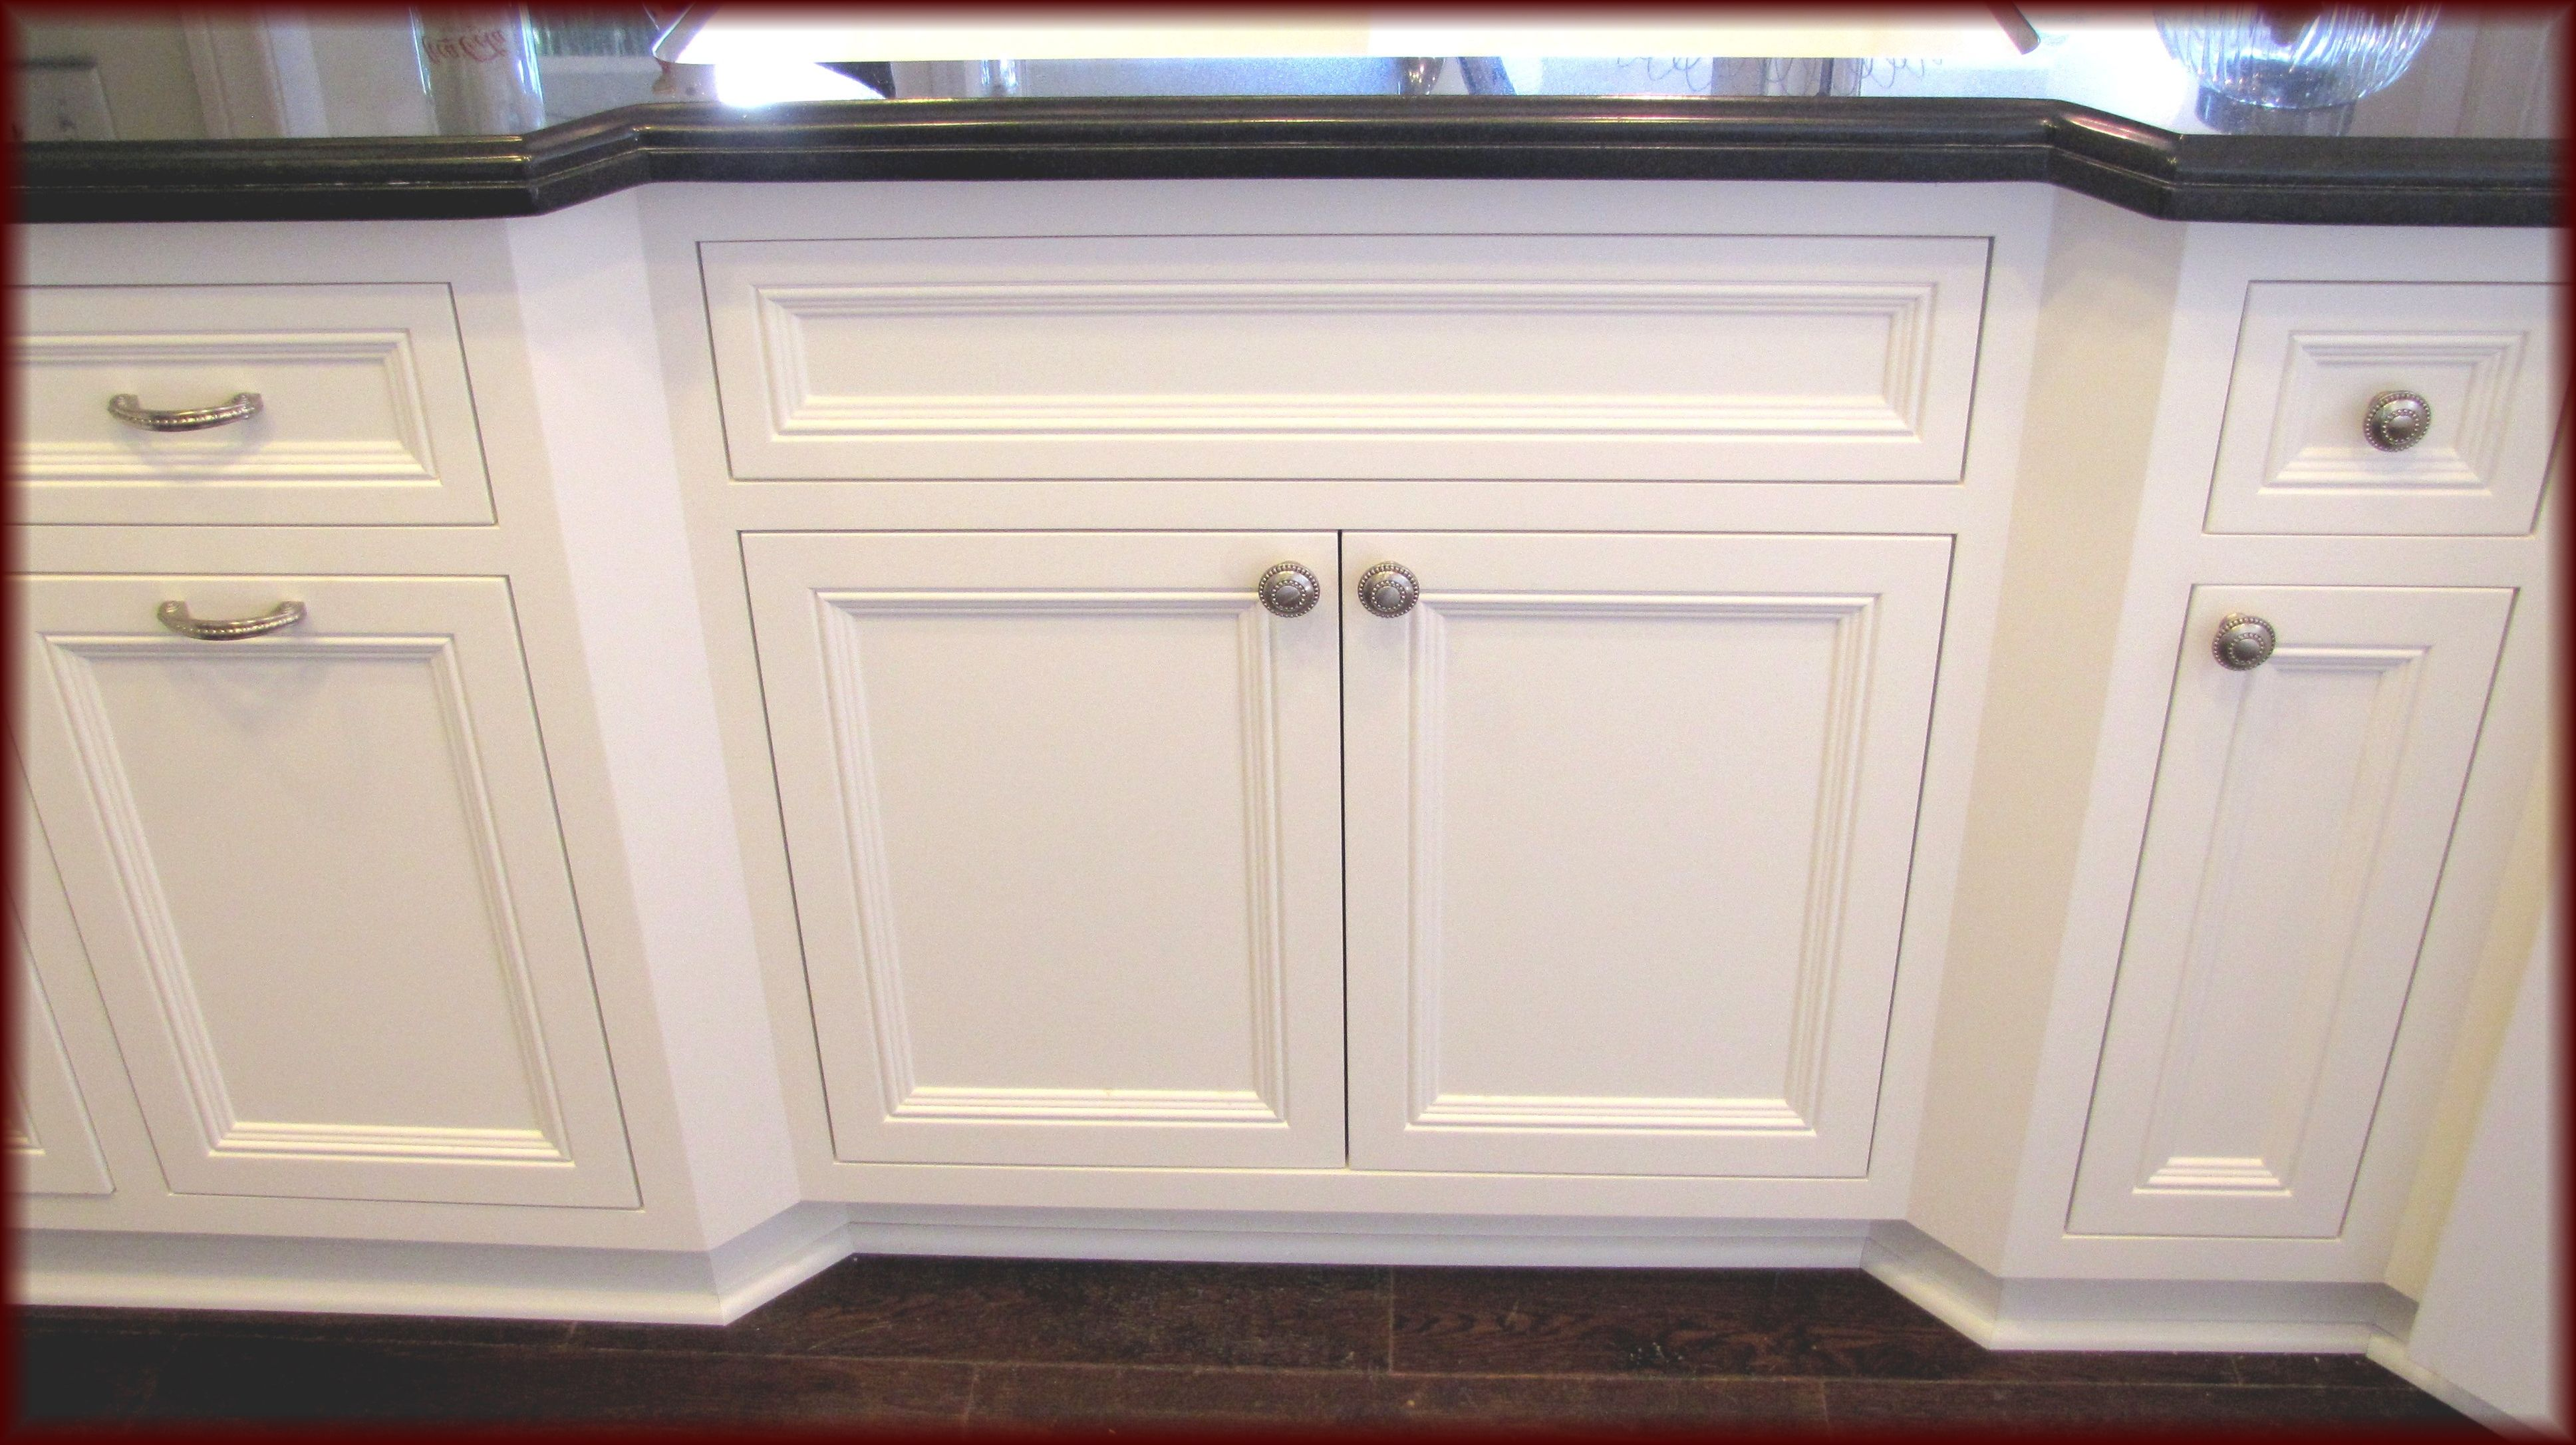 Custom Kitchen Cabinets Built In Flush Inset Style With White Finish In 2020 Finish Kitchen Cabinets Kitchen Cabinet Doors Custom Kitchen Cabinets